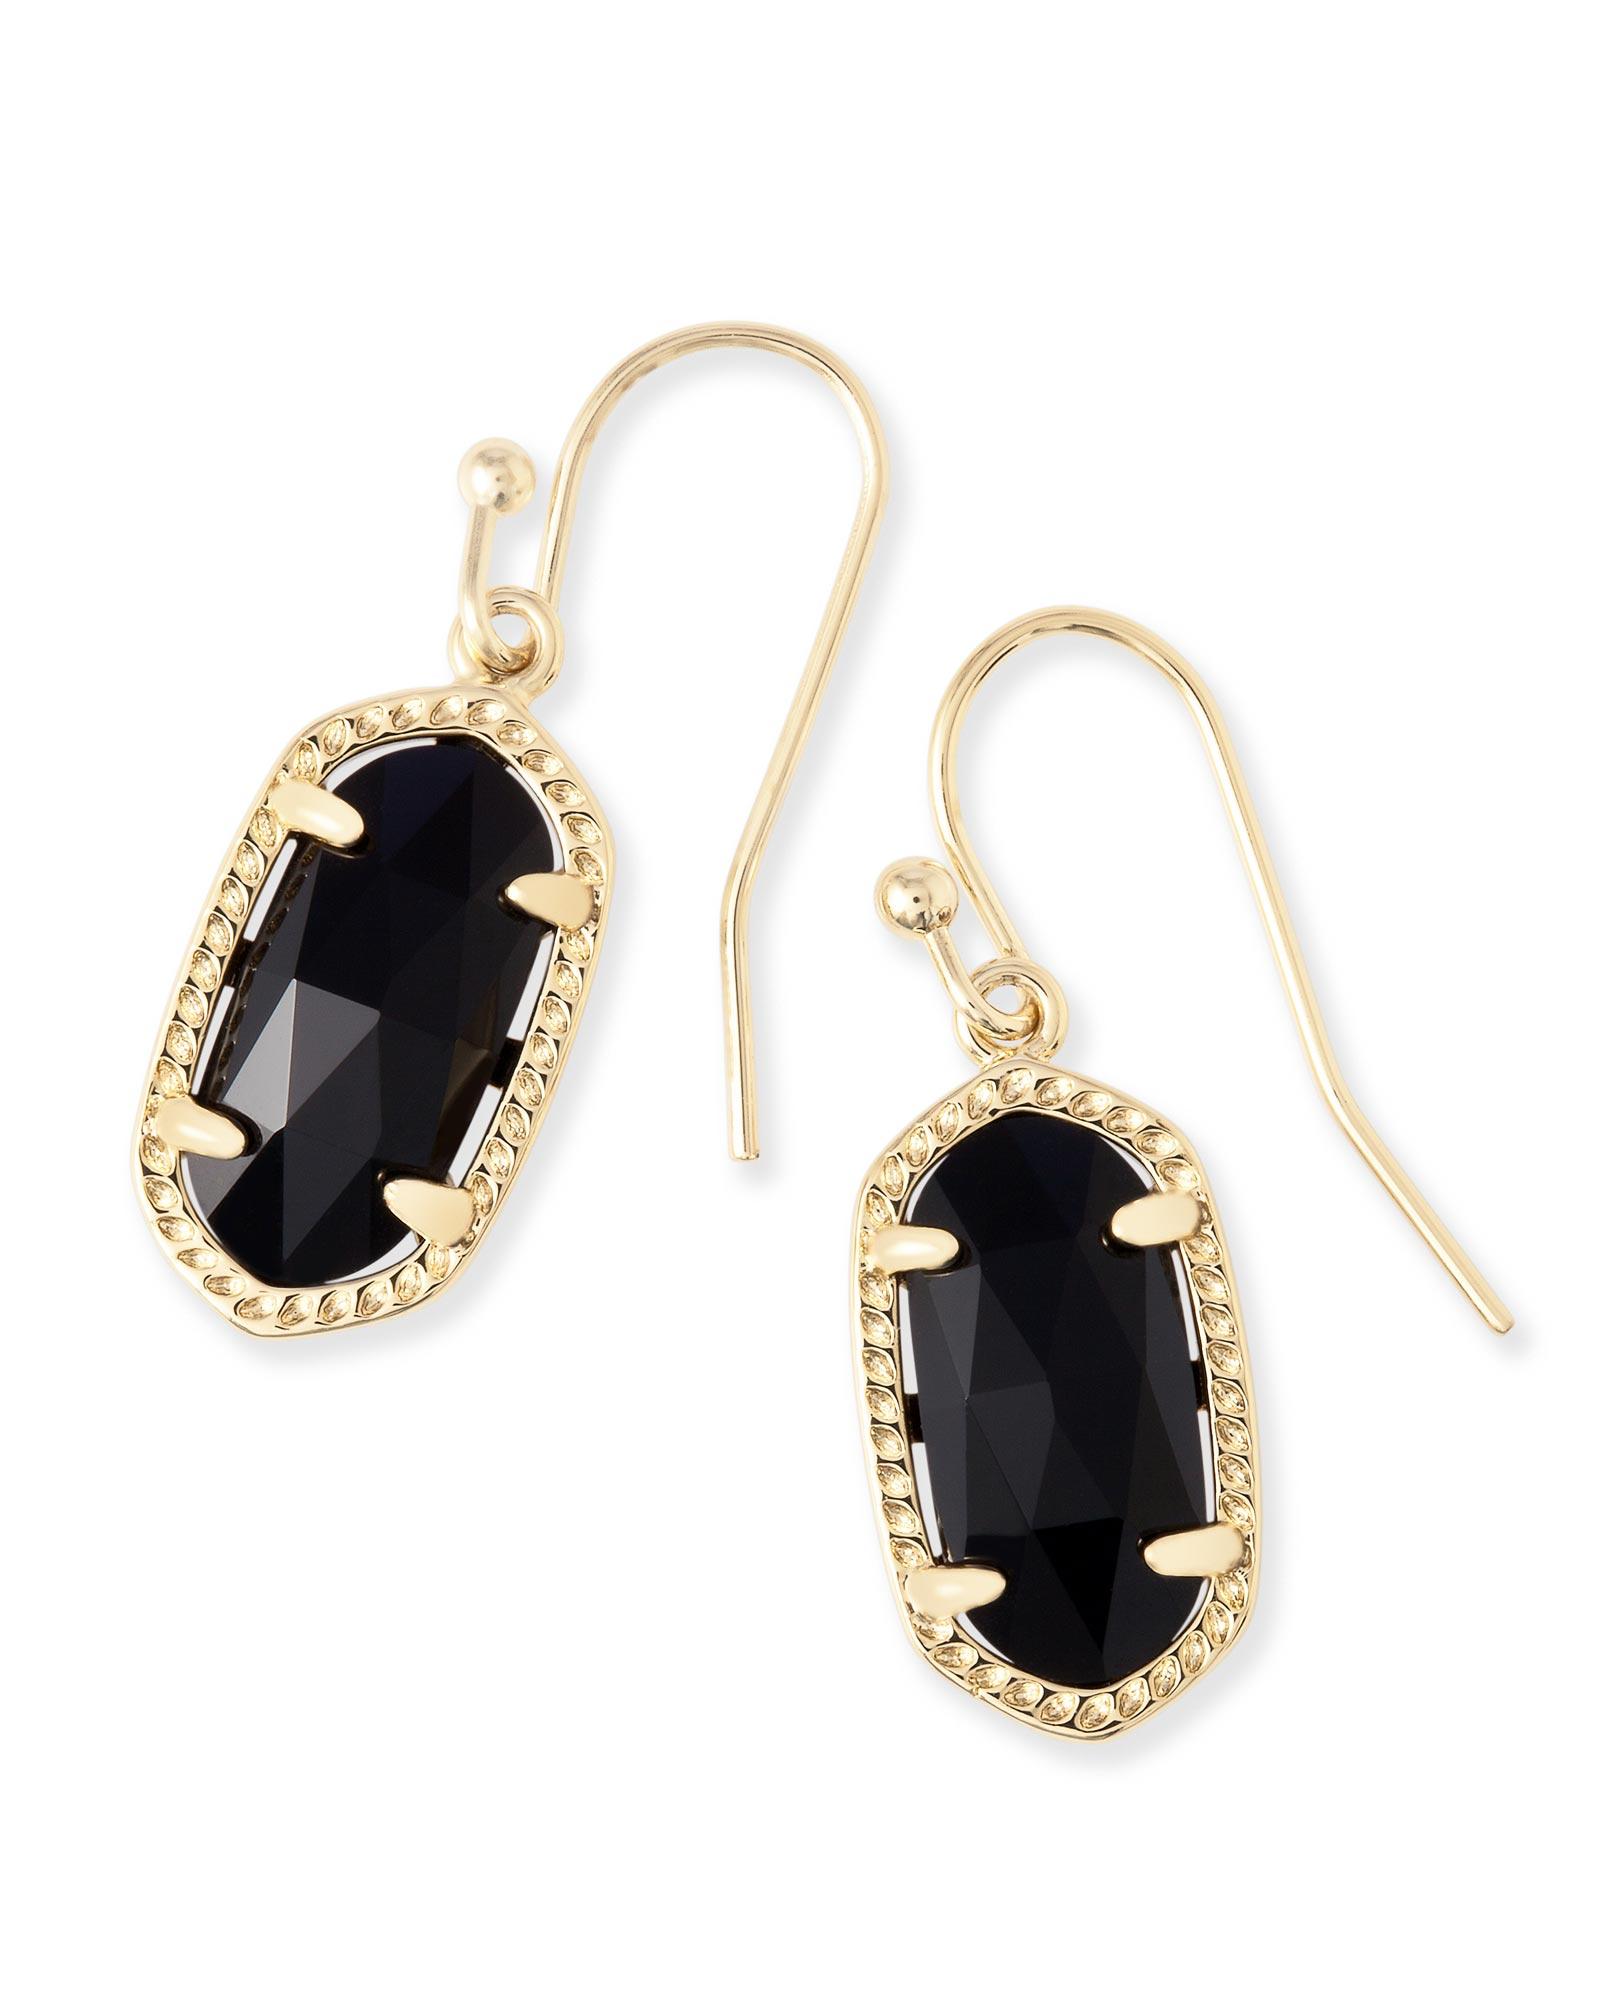 Coupons for kendra scott earrings